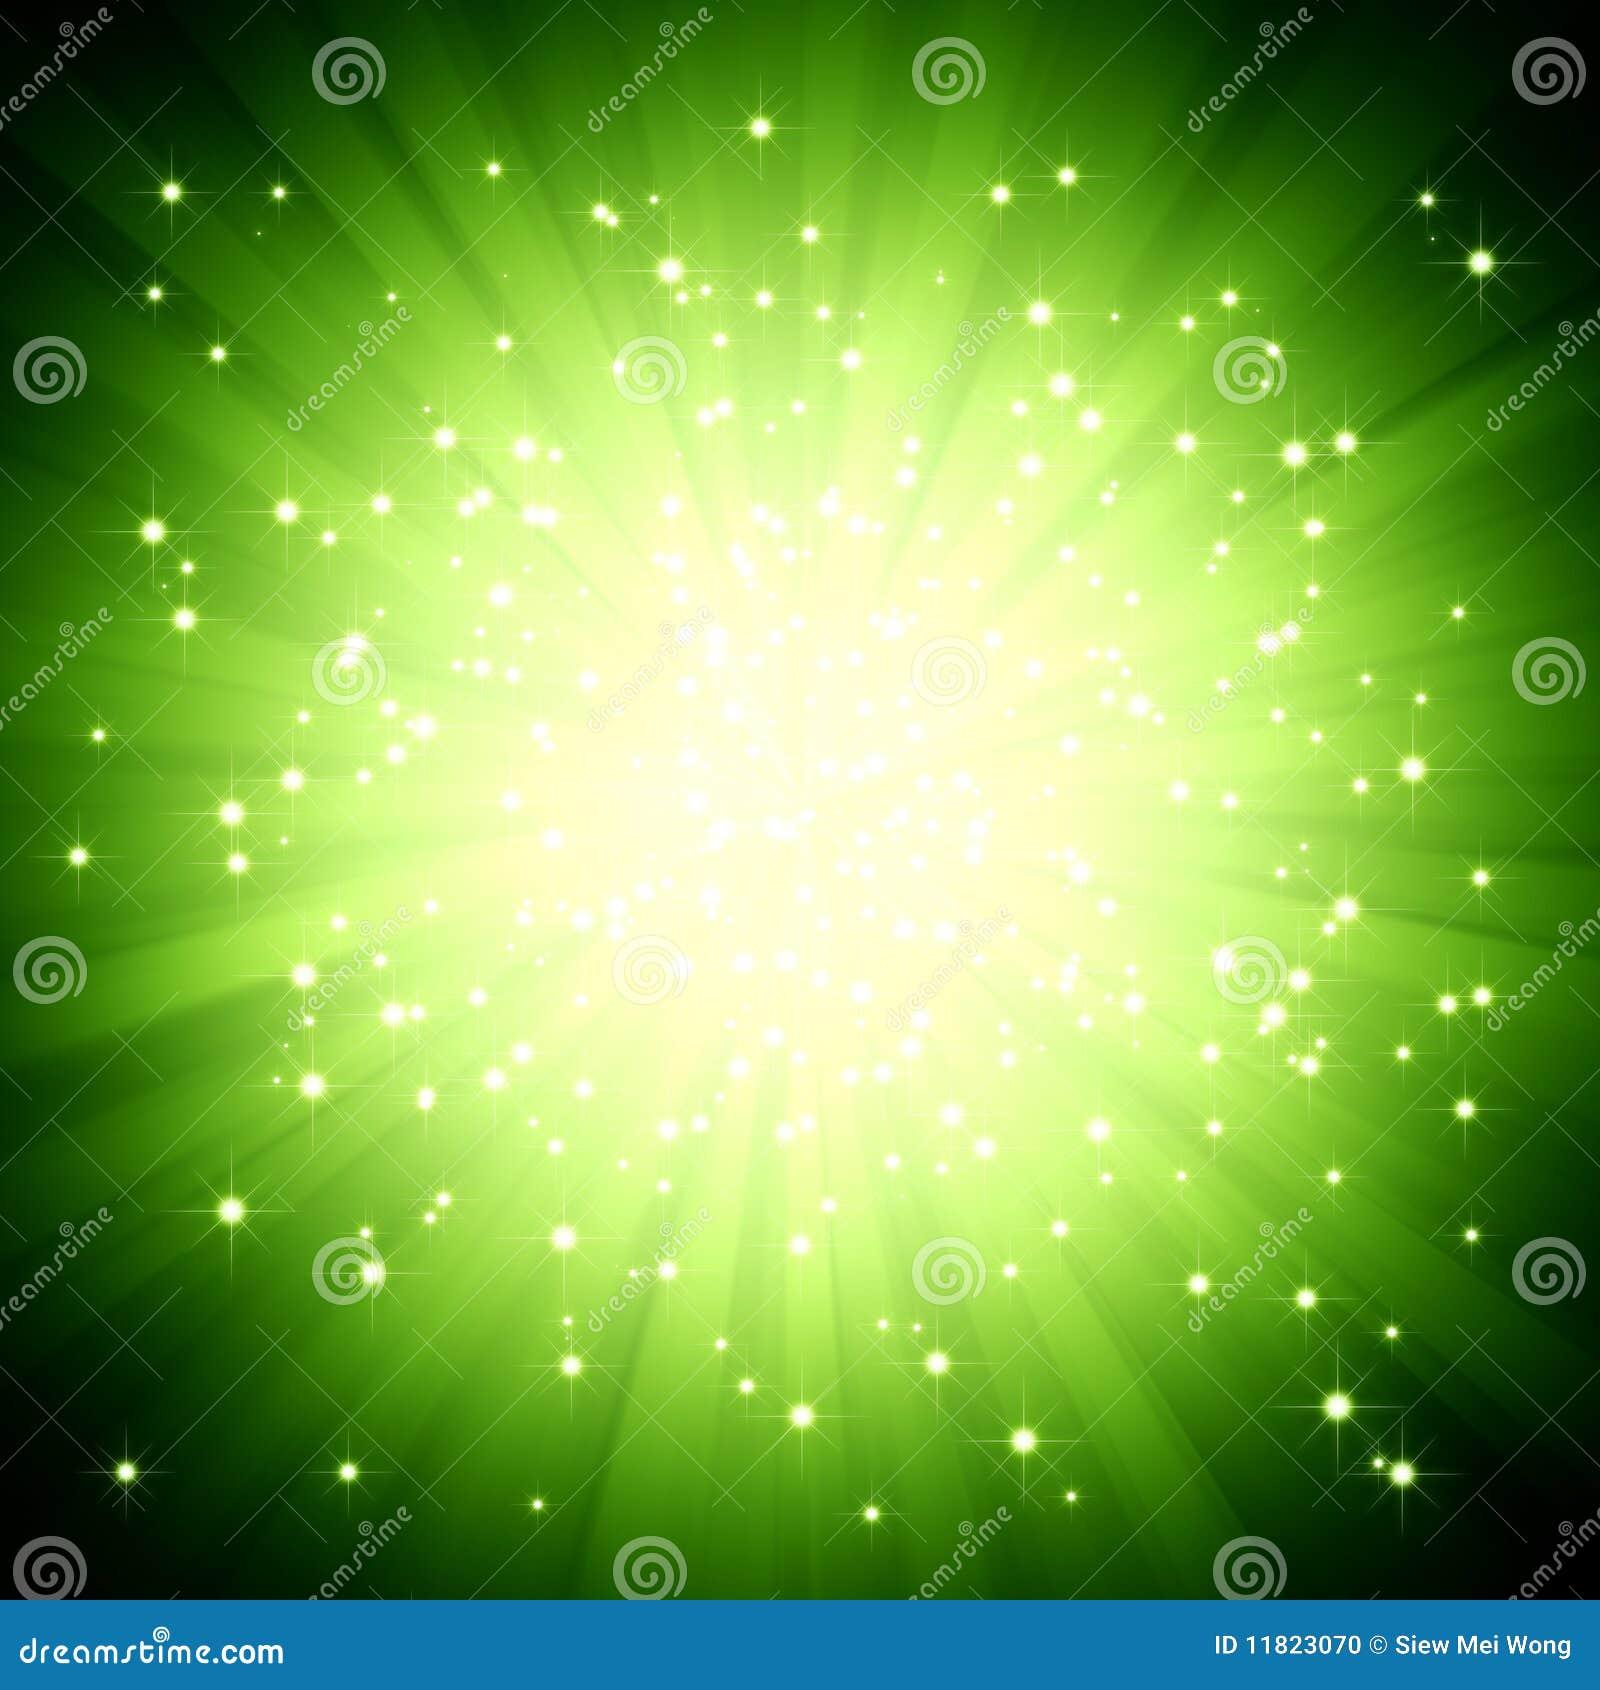 Sparkle Green Light Burst With Stars Stock Photo - Image: 11823070